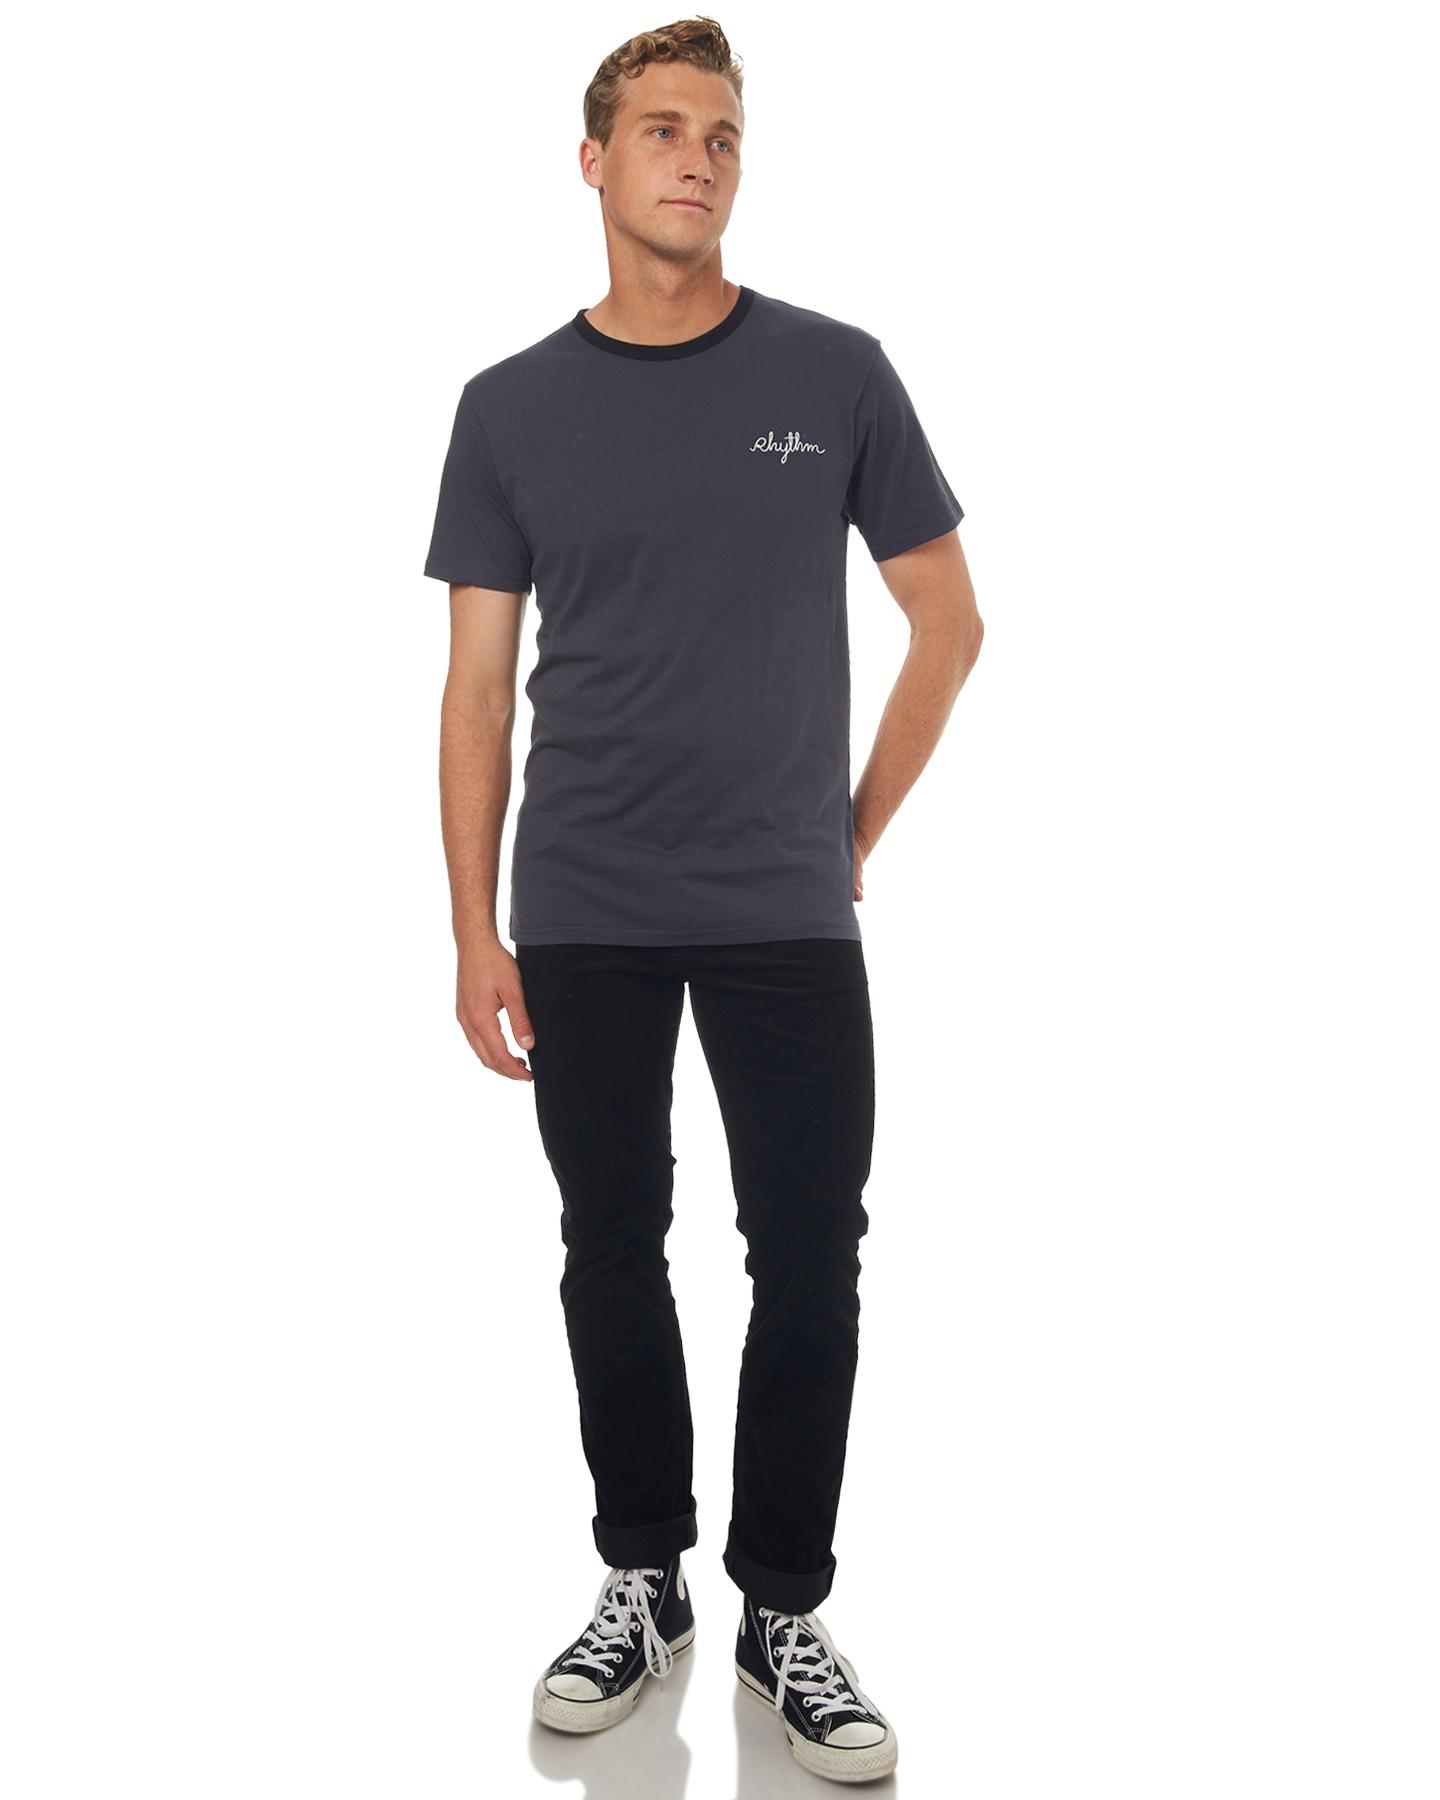 Rhythm Ringer Mens T Shirt Black Surfstitch